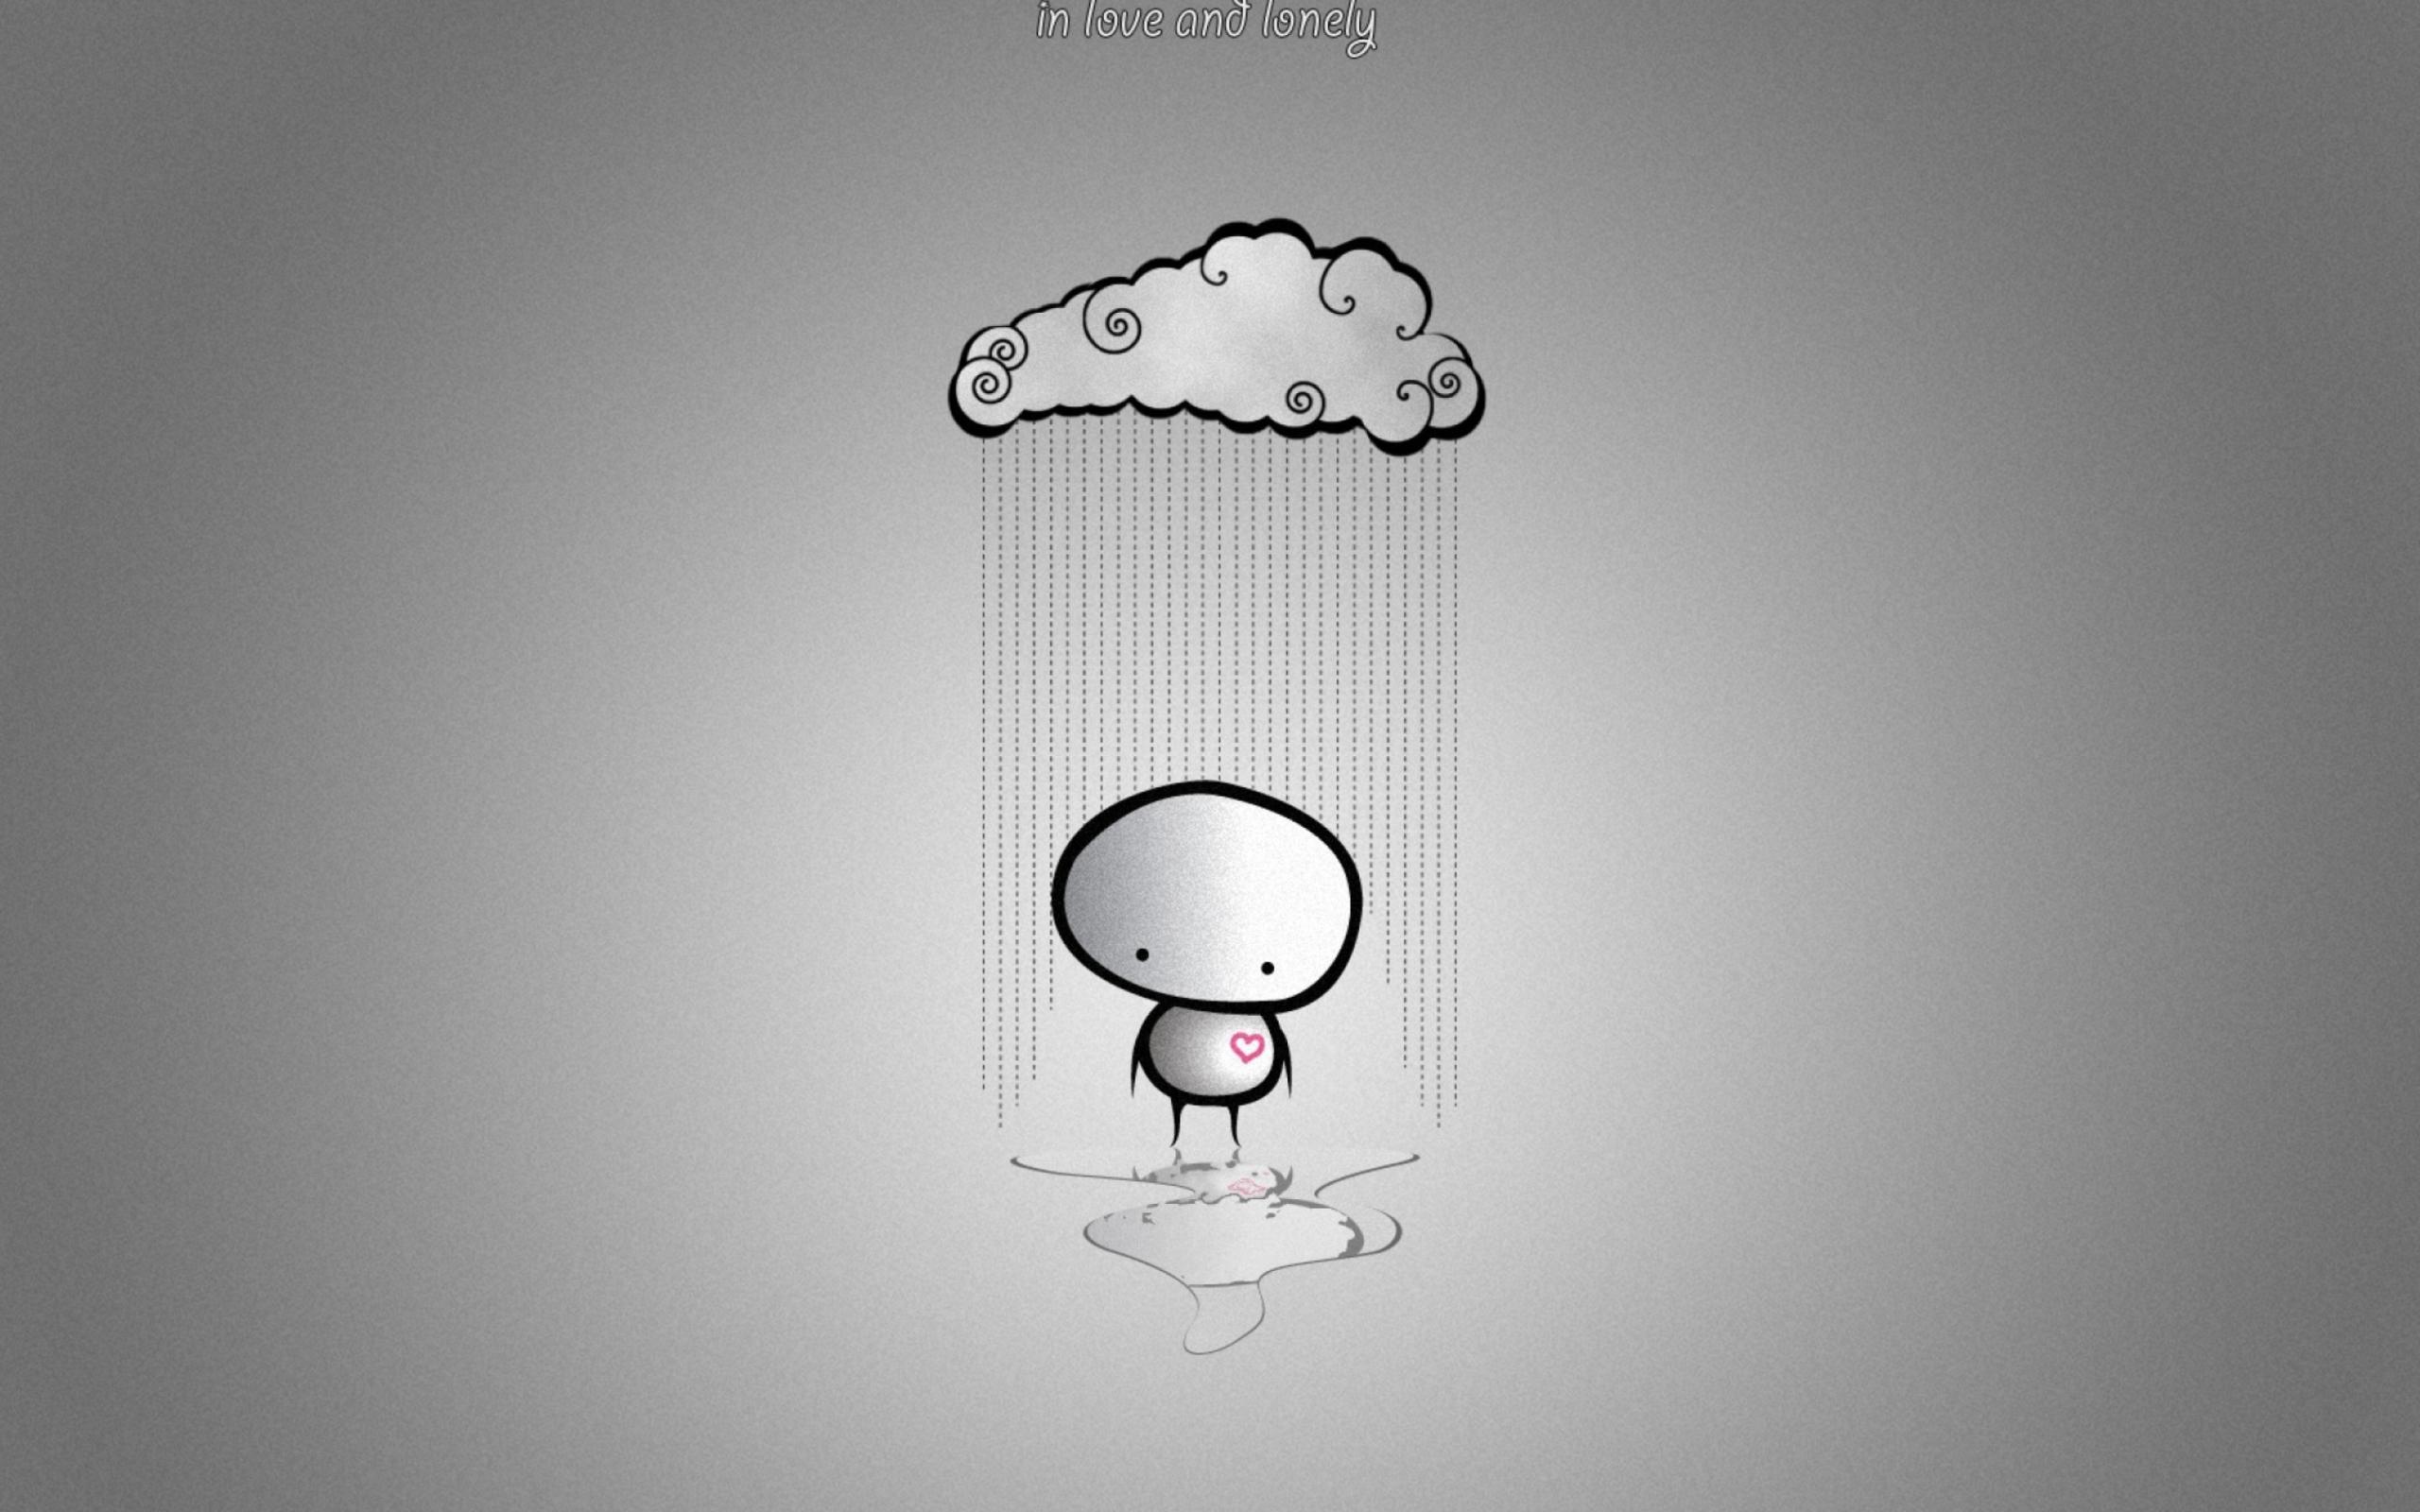 Картинки пессимиста на аву